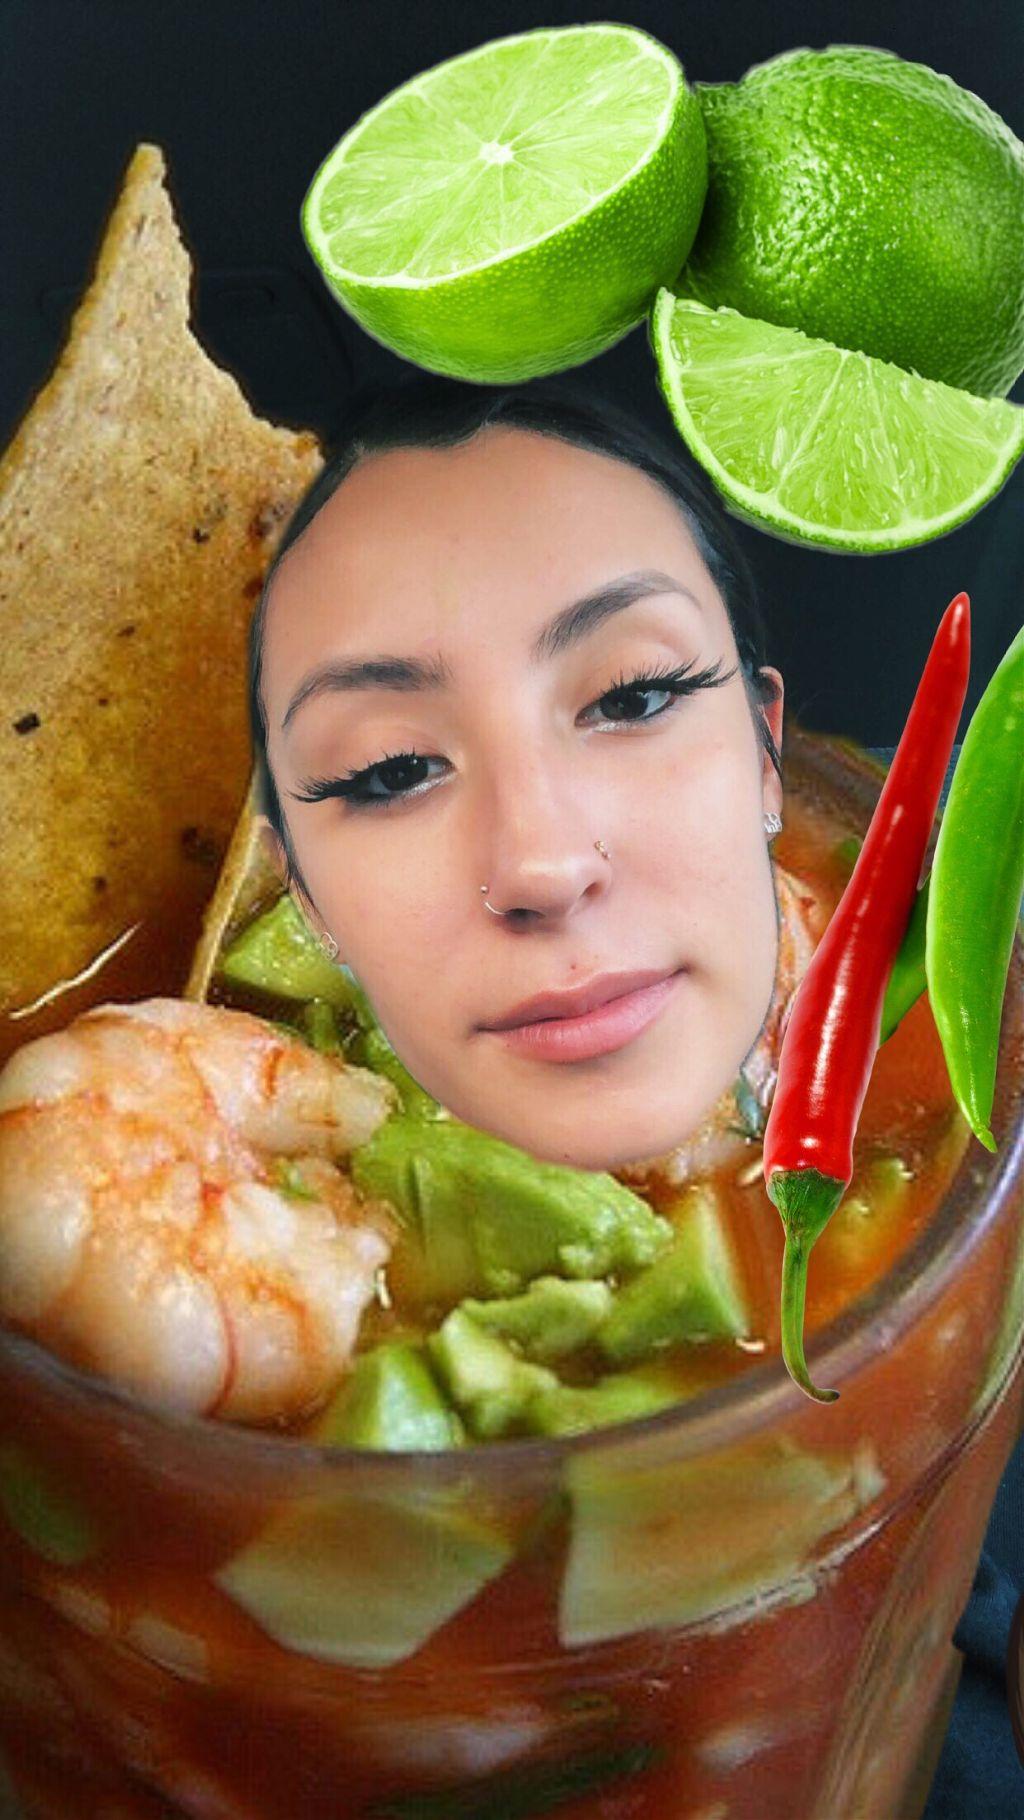 #freetoedit #shrimpcocktail #lime #frida #fridax #fridaxitlalhic #avacado #chips #mexican #eyelashes #chile #hotsauce #cilantro #onion #eyebrowsonfleek #shrimp